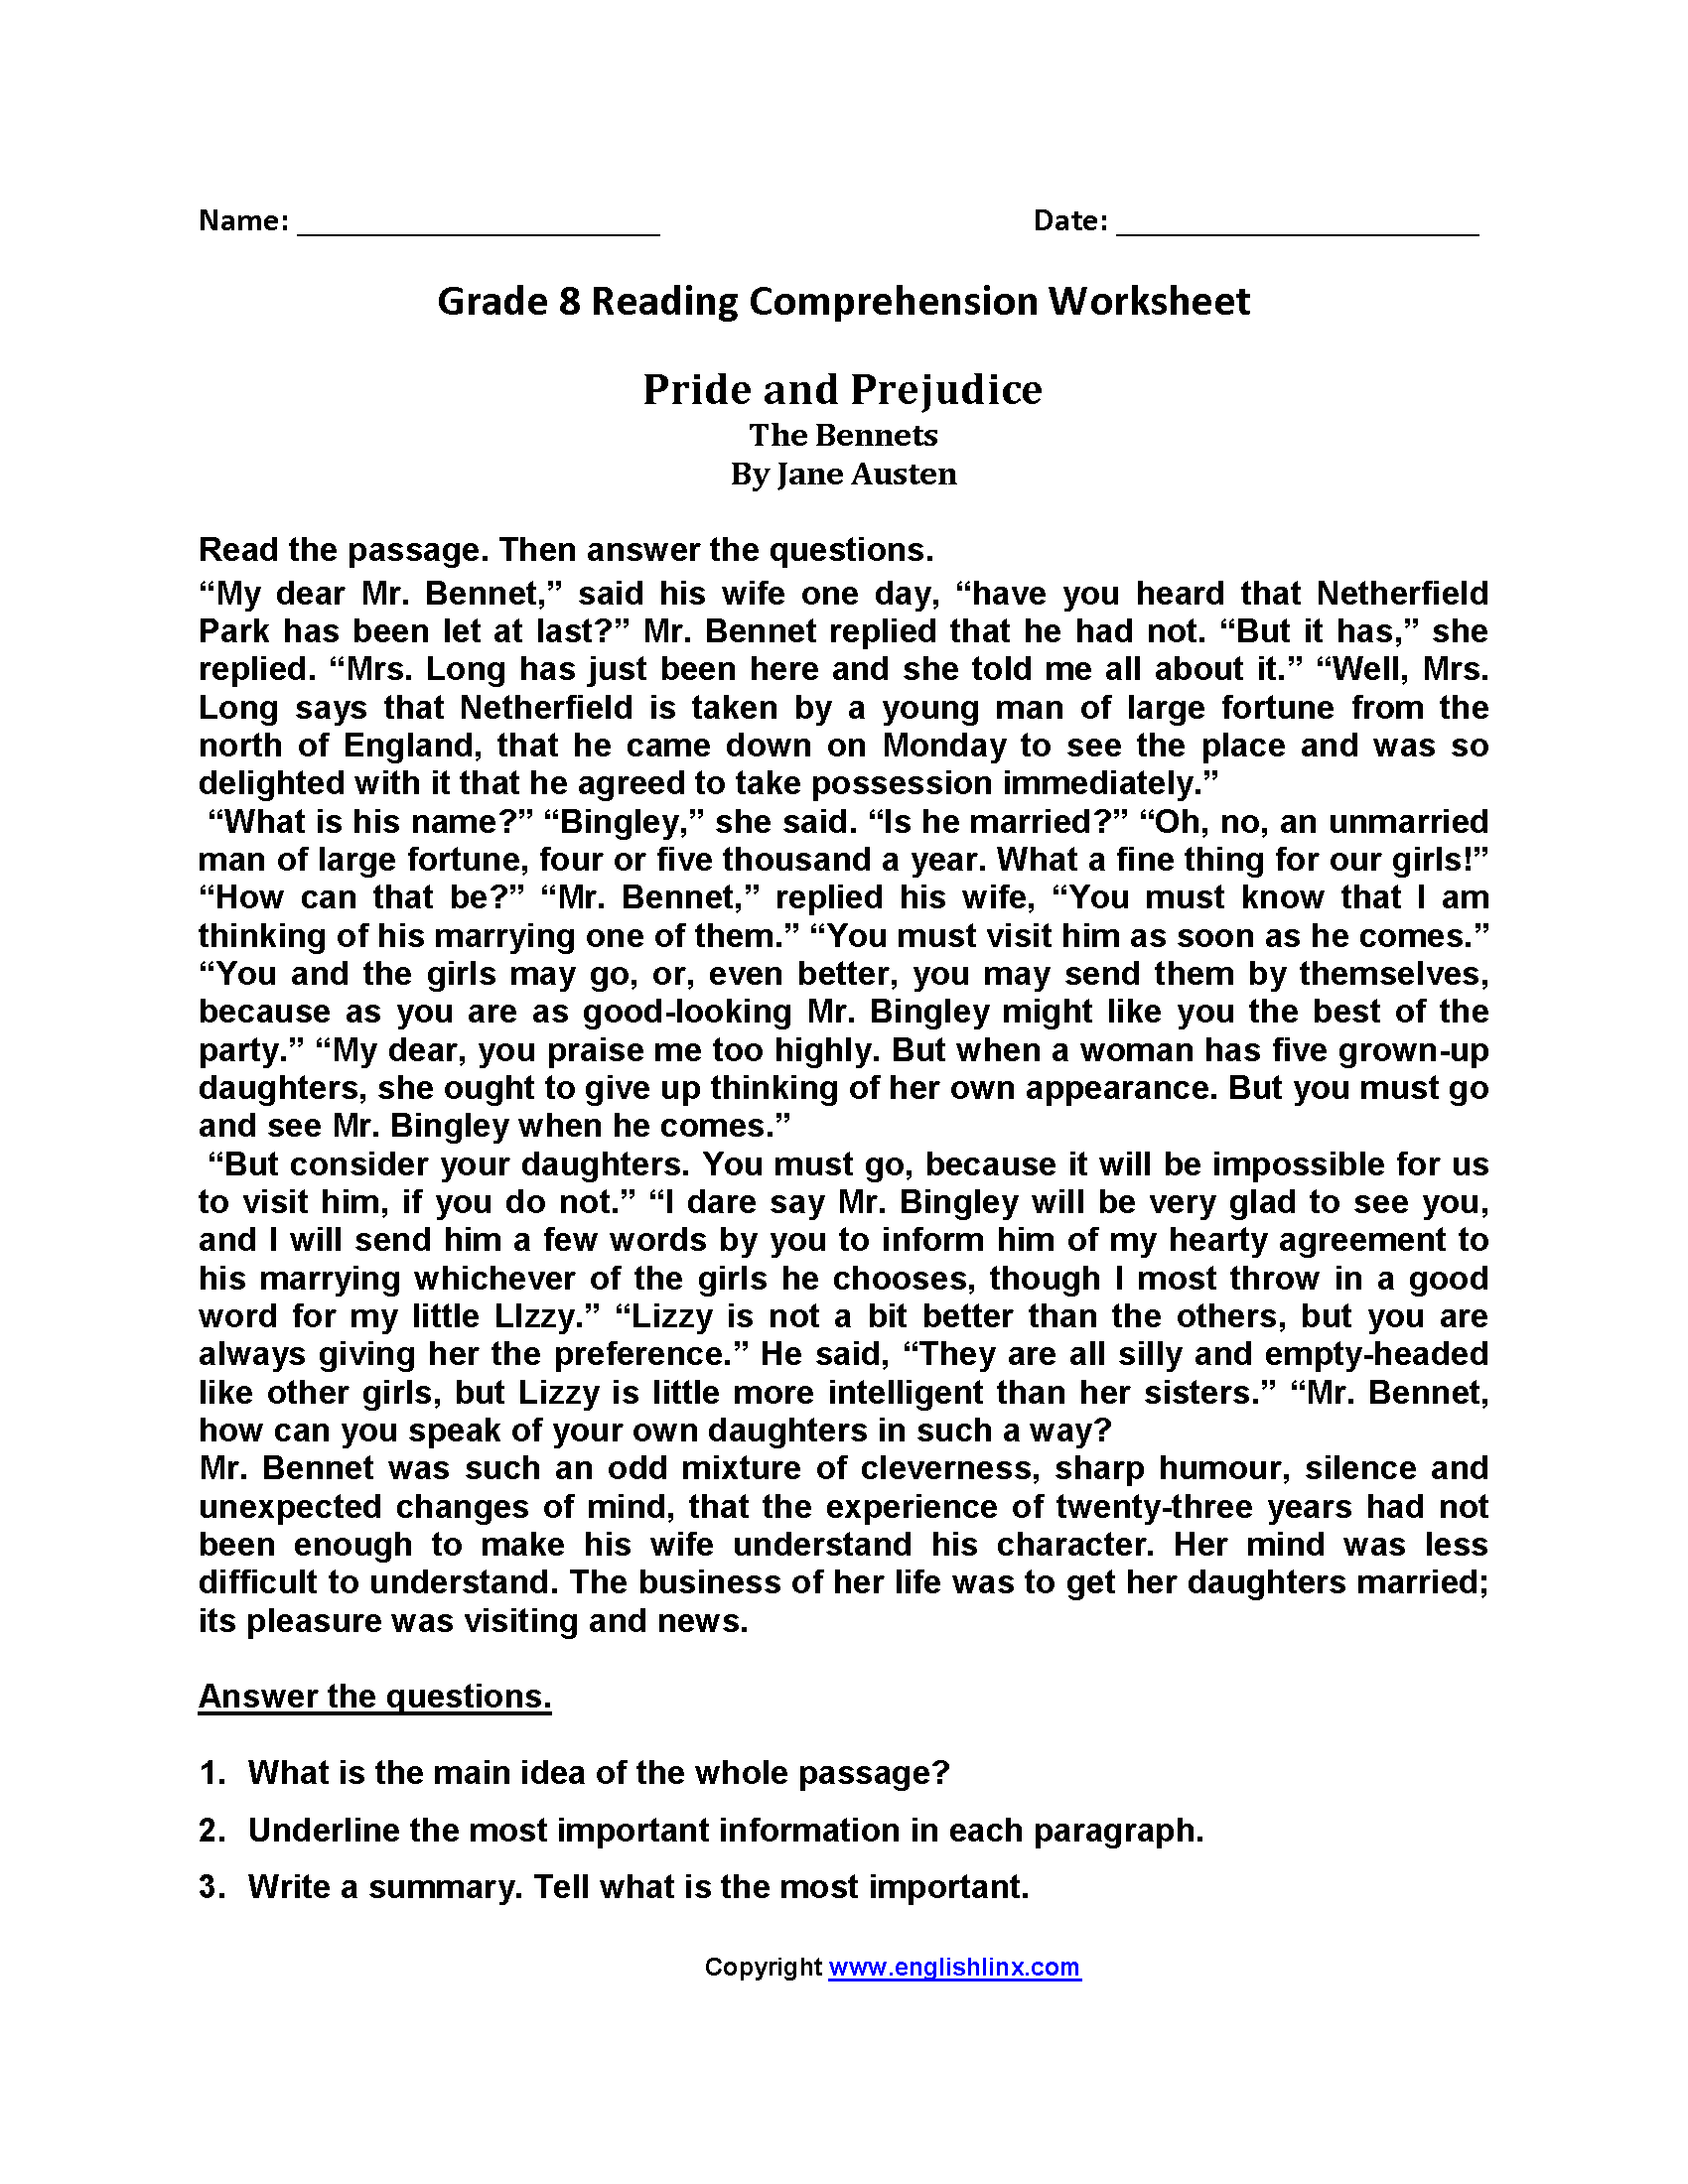 Pride and Prejudice Eighth Grade Reading Worksheets   Reading worksheets [ 2200 x 1700 Pixel ]